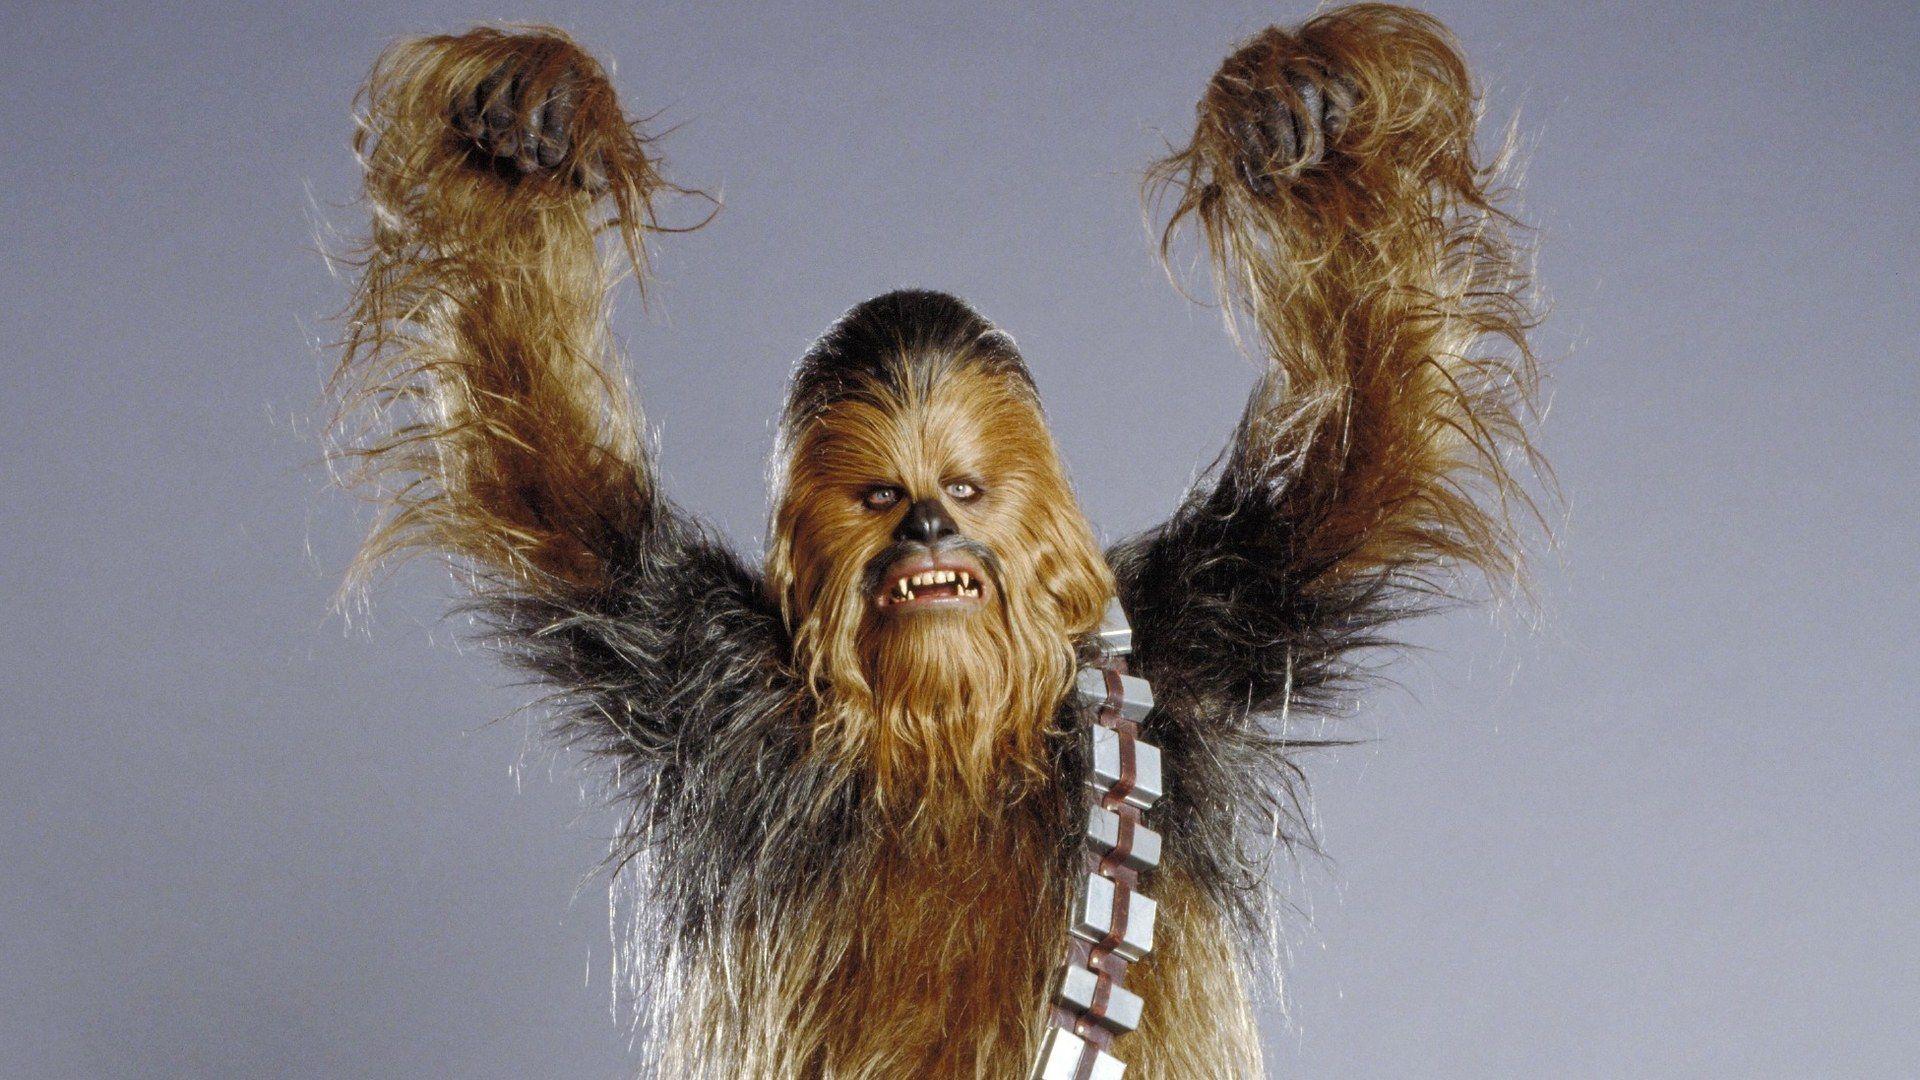 Chewbacca 1080p background